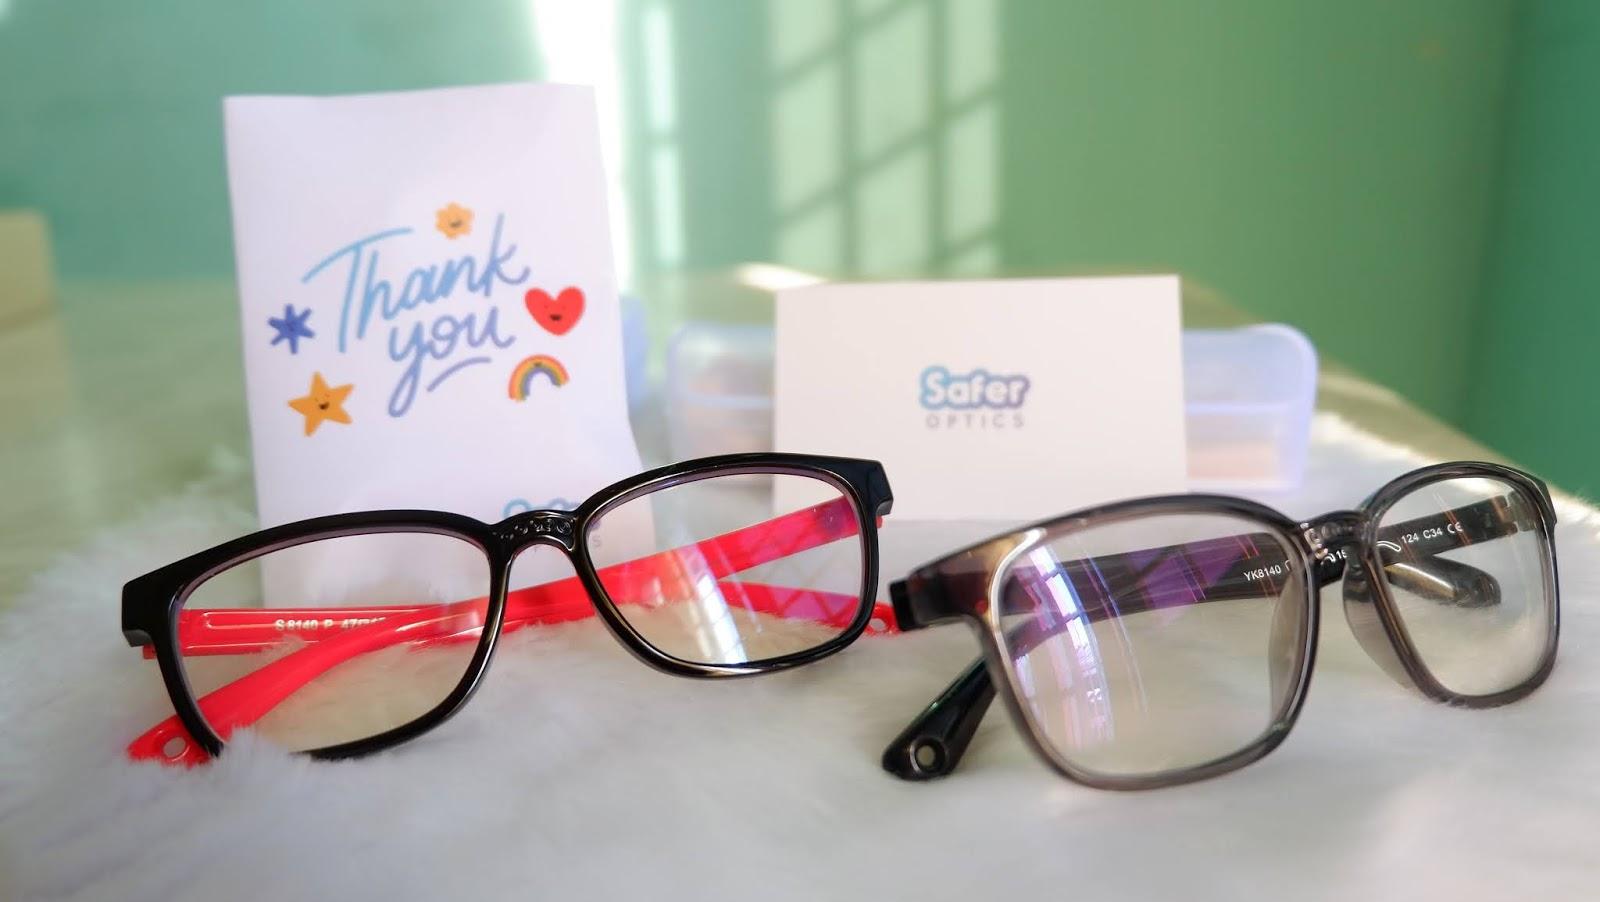 Review Safer Optics Anti Blue Light Eye Wear